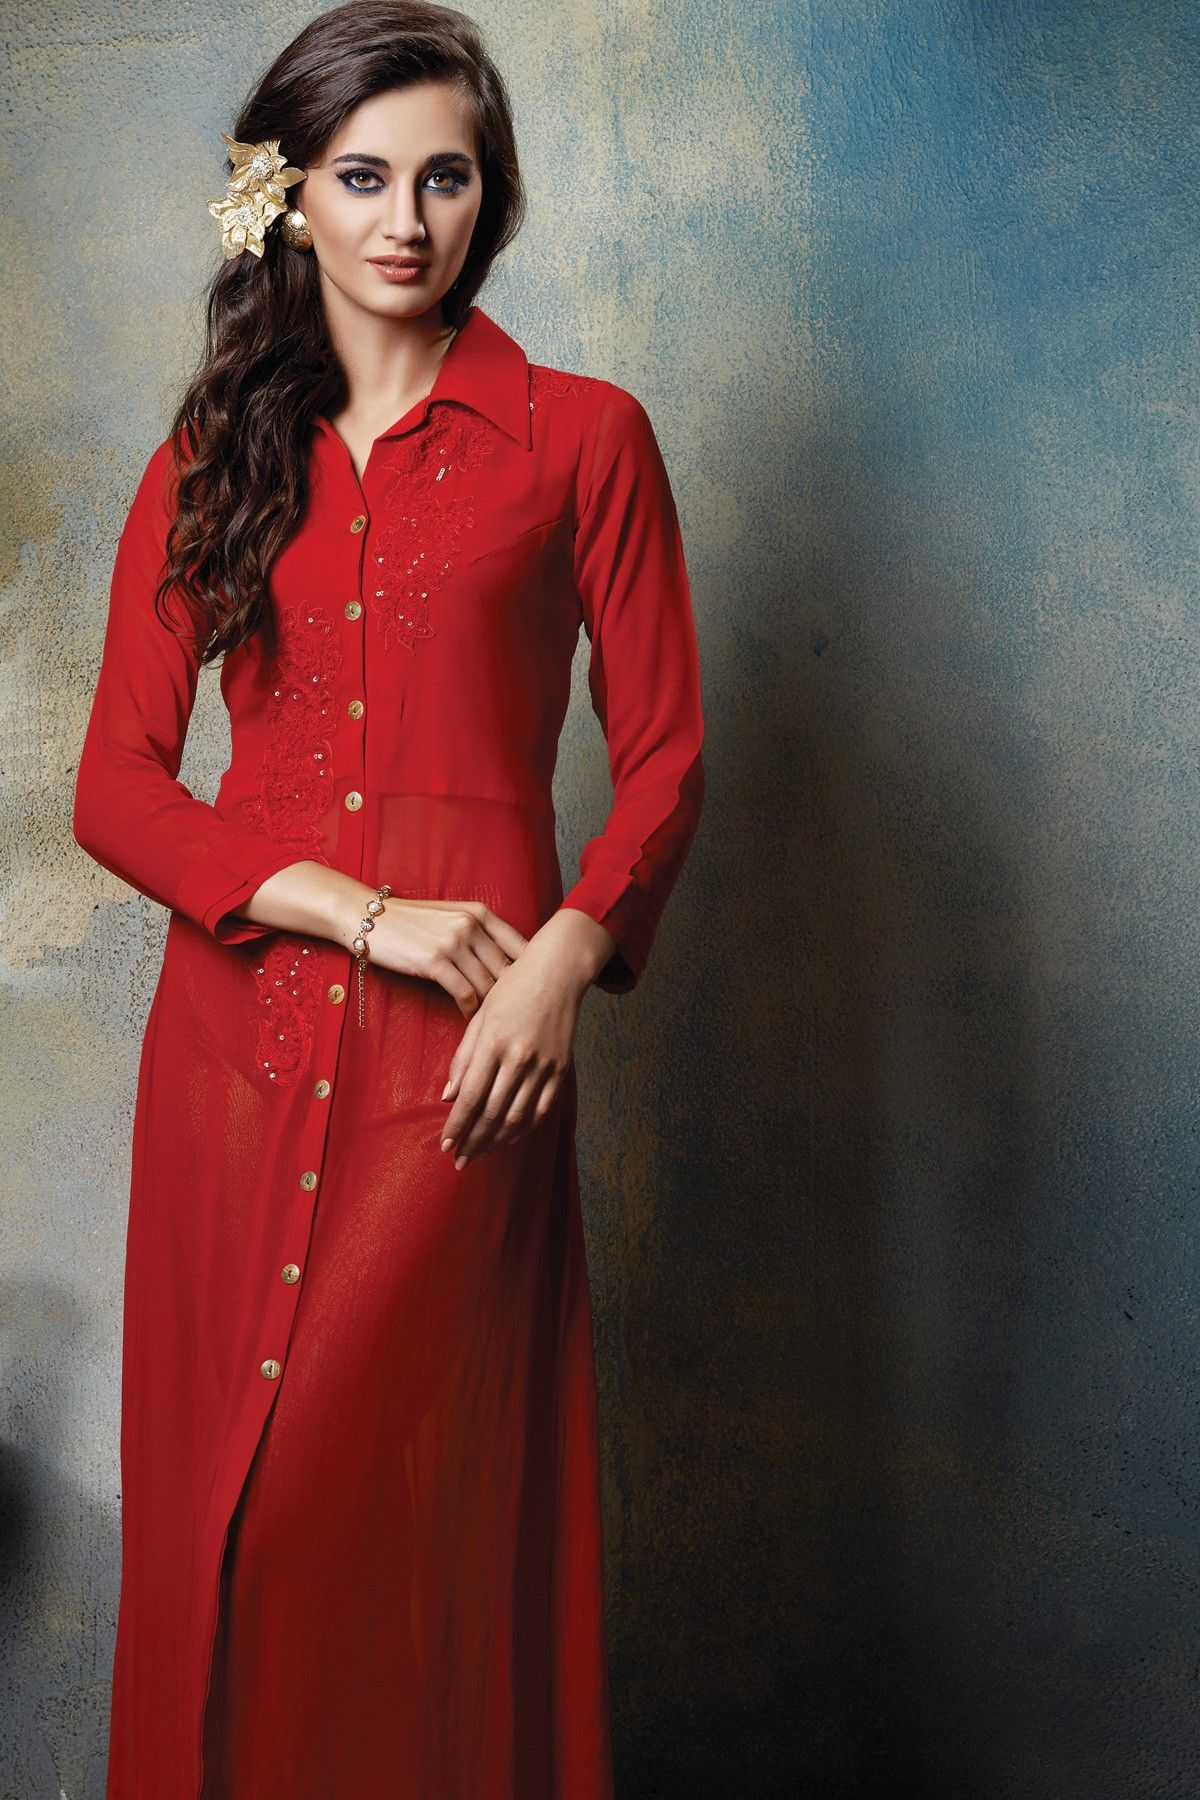 Shirt design kurti -  Red Georgette Discerning Kurti With Full Sleeves Shirt Collar